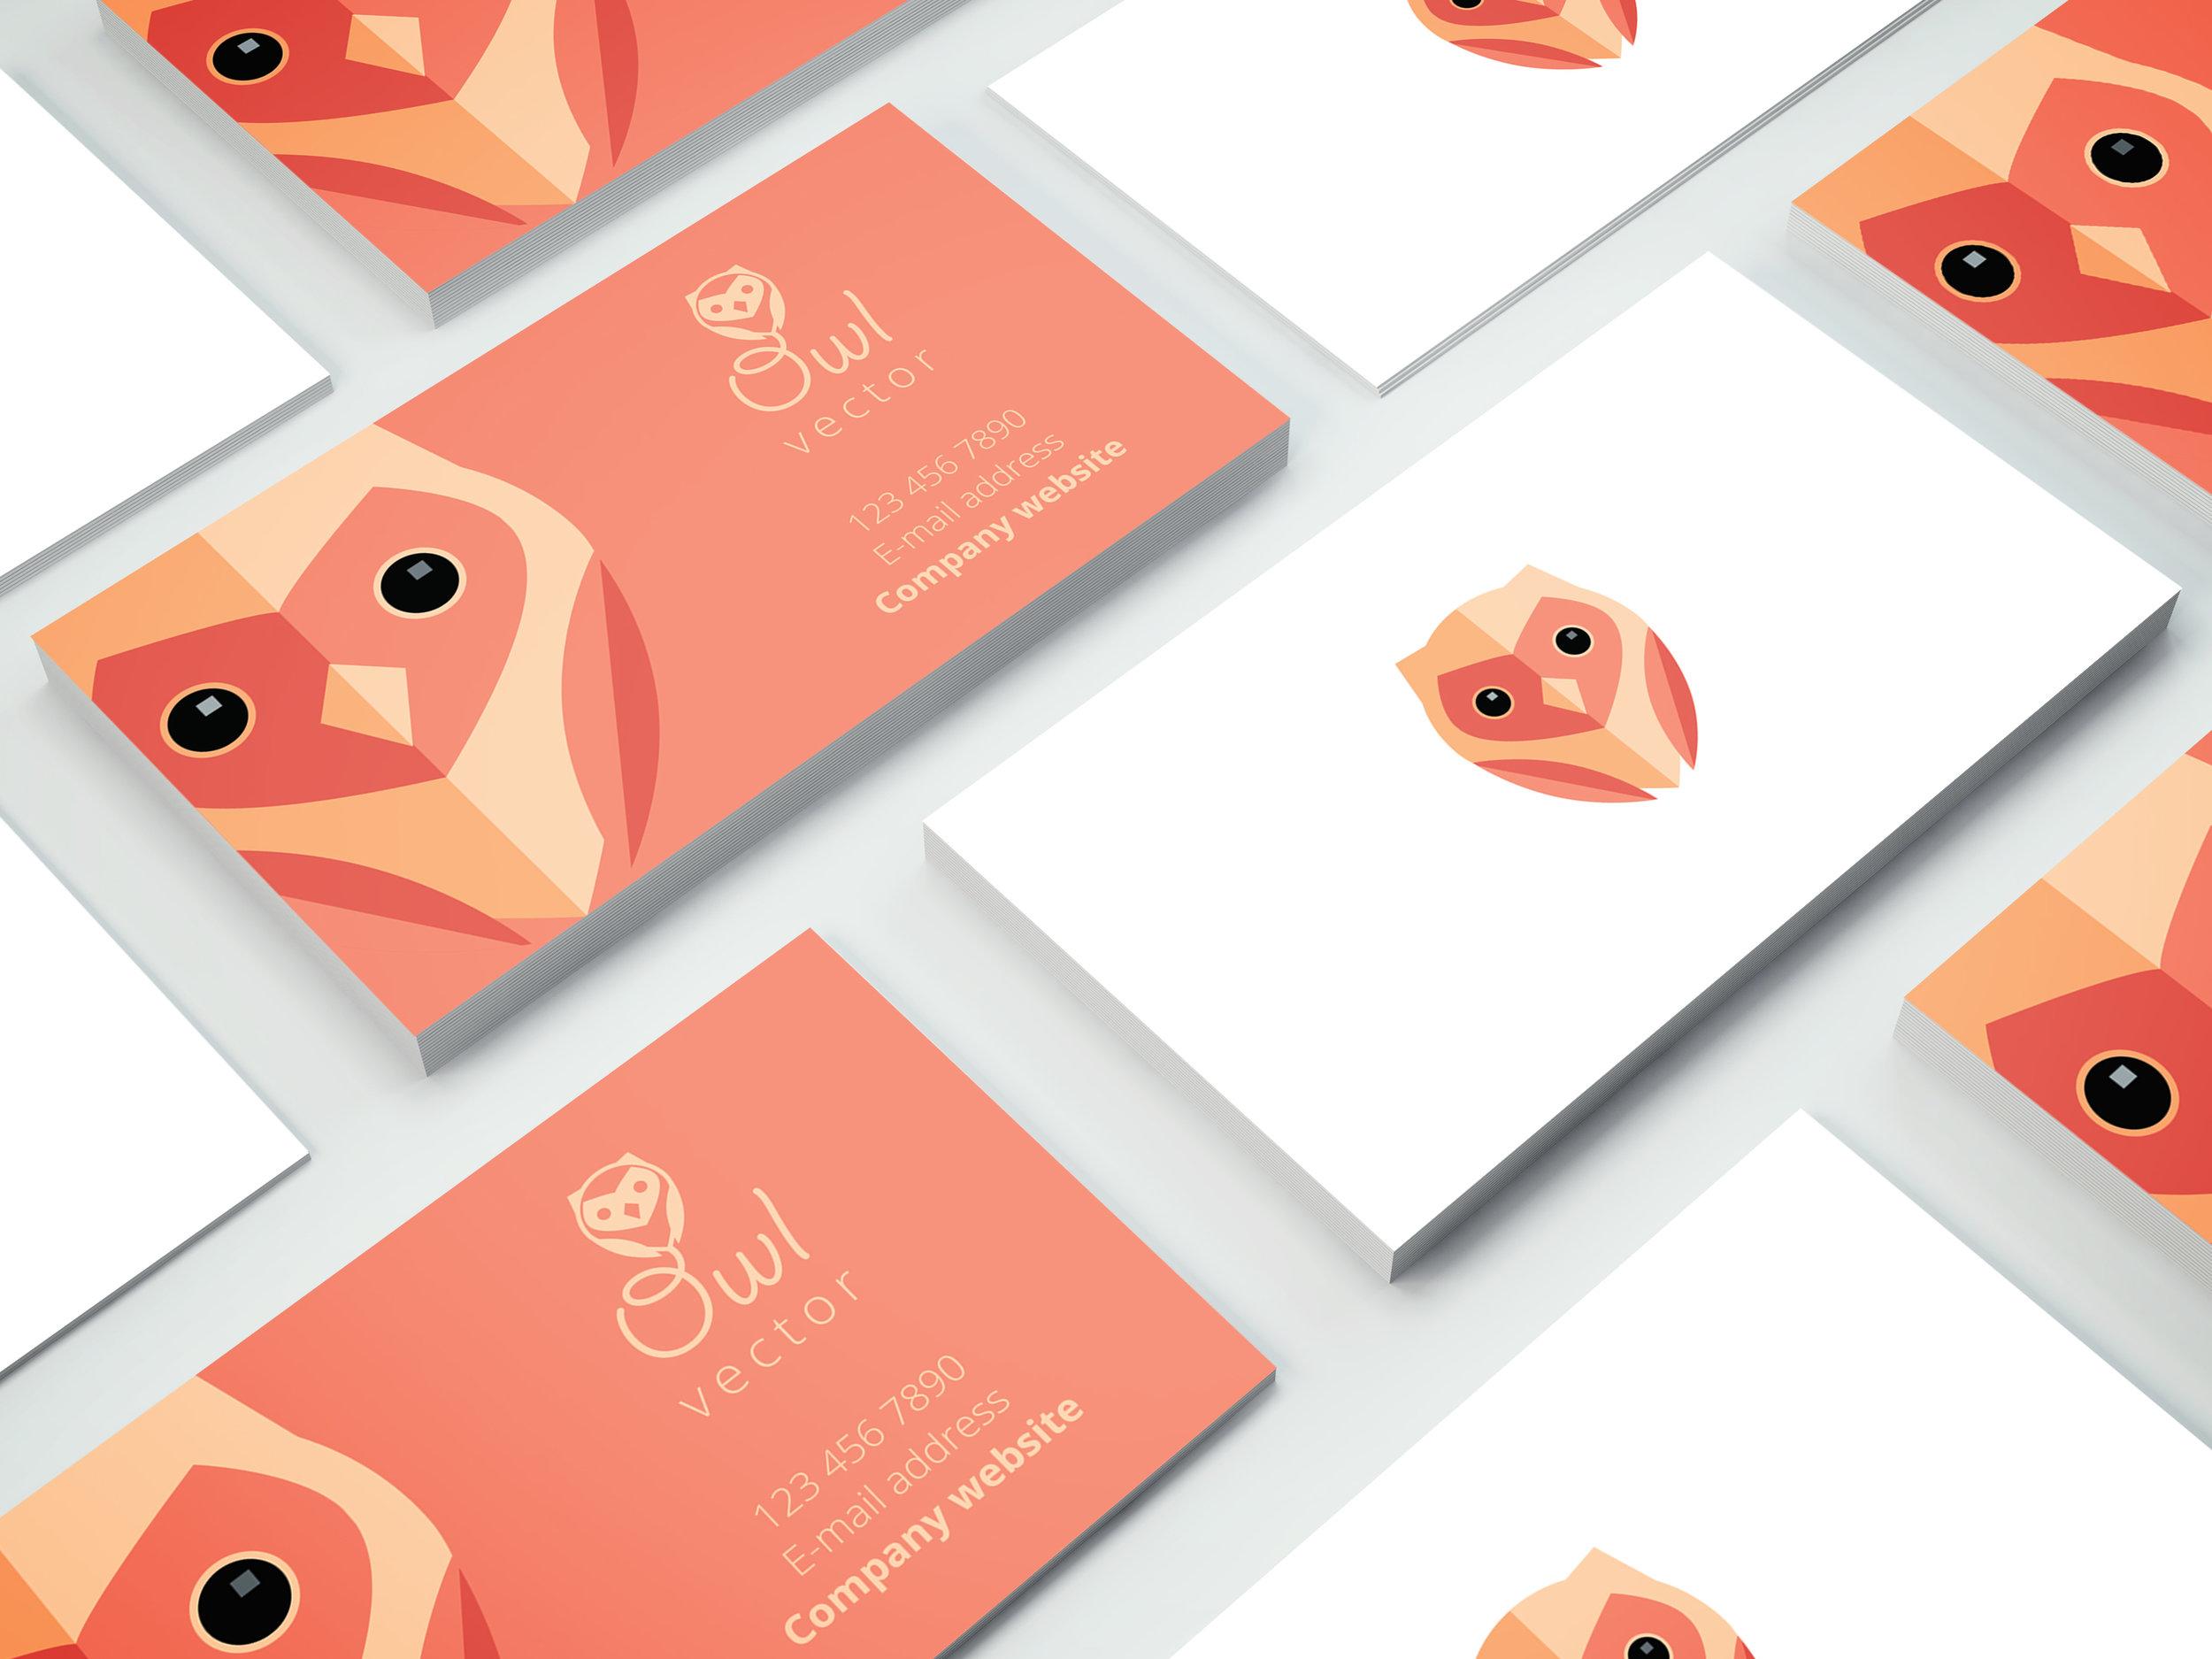 Business-Card-Mockup-Vo4l.jpg